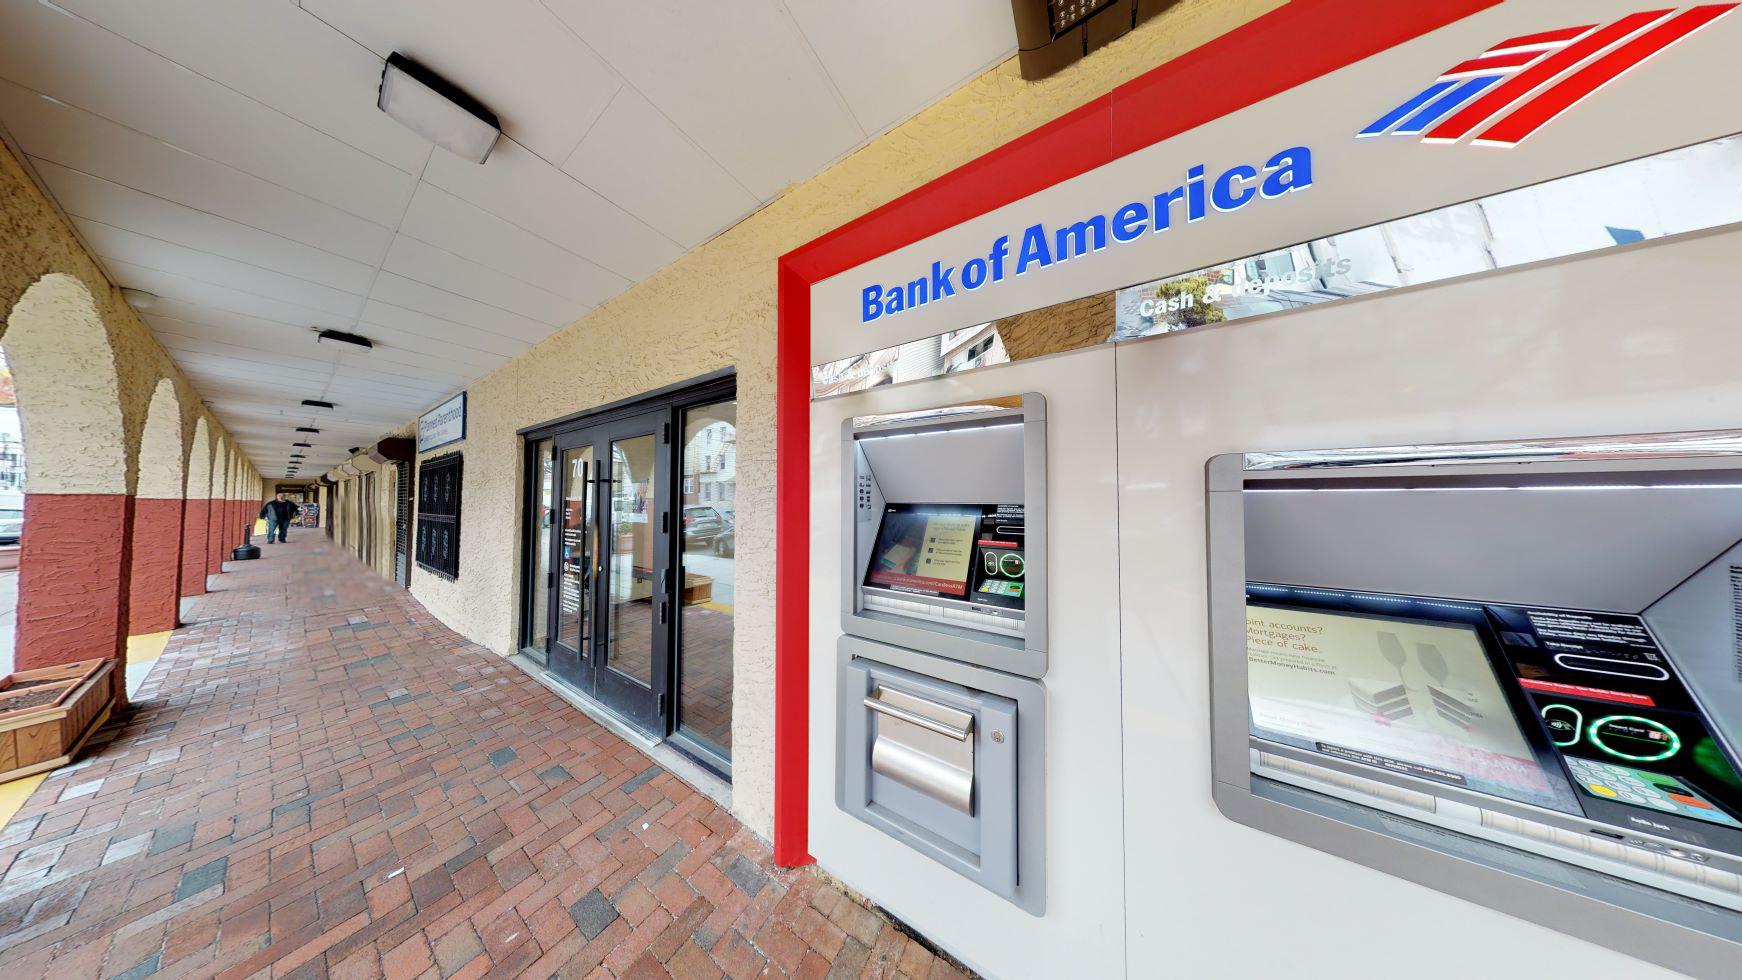 Bank of America financial center with drive-thru ATM   70 Adams St, Newark, NJ 07105